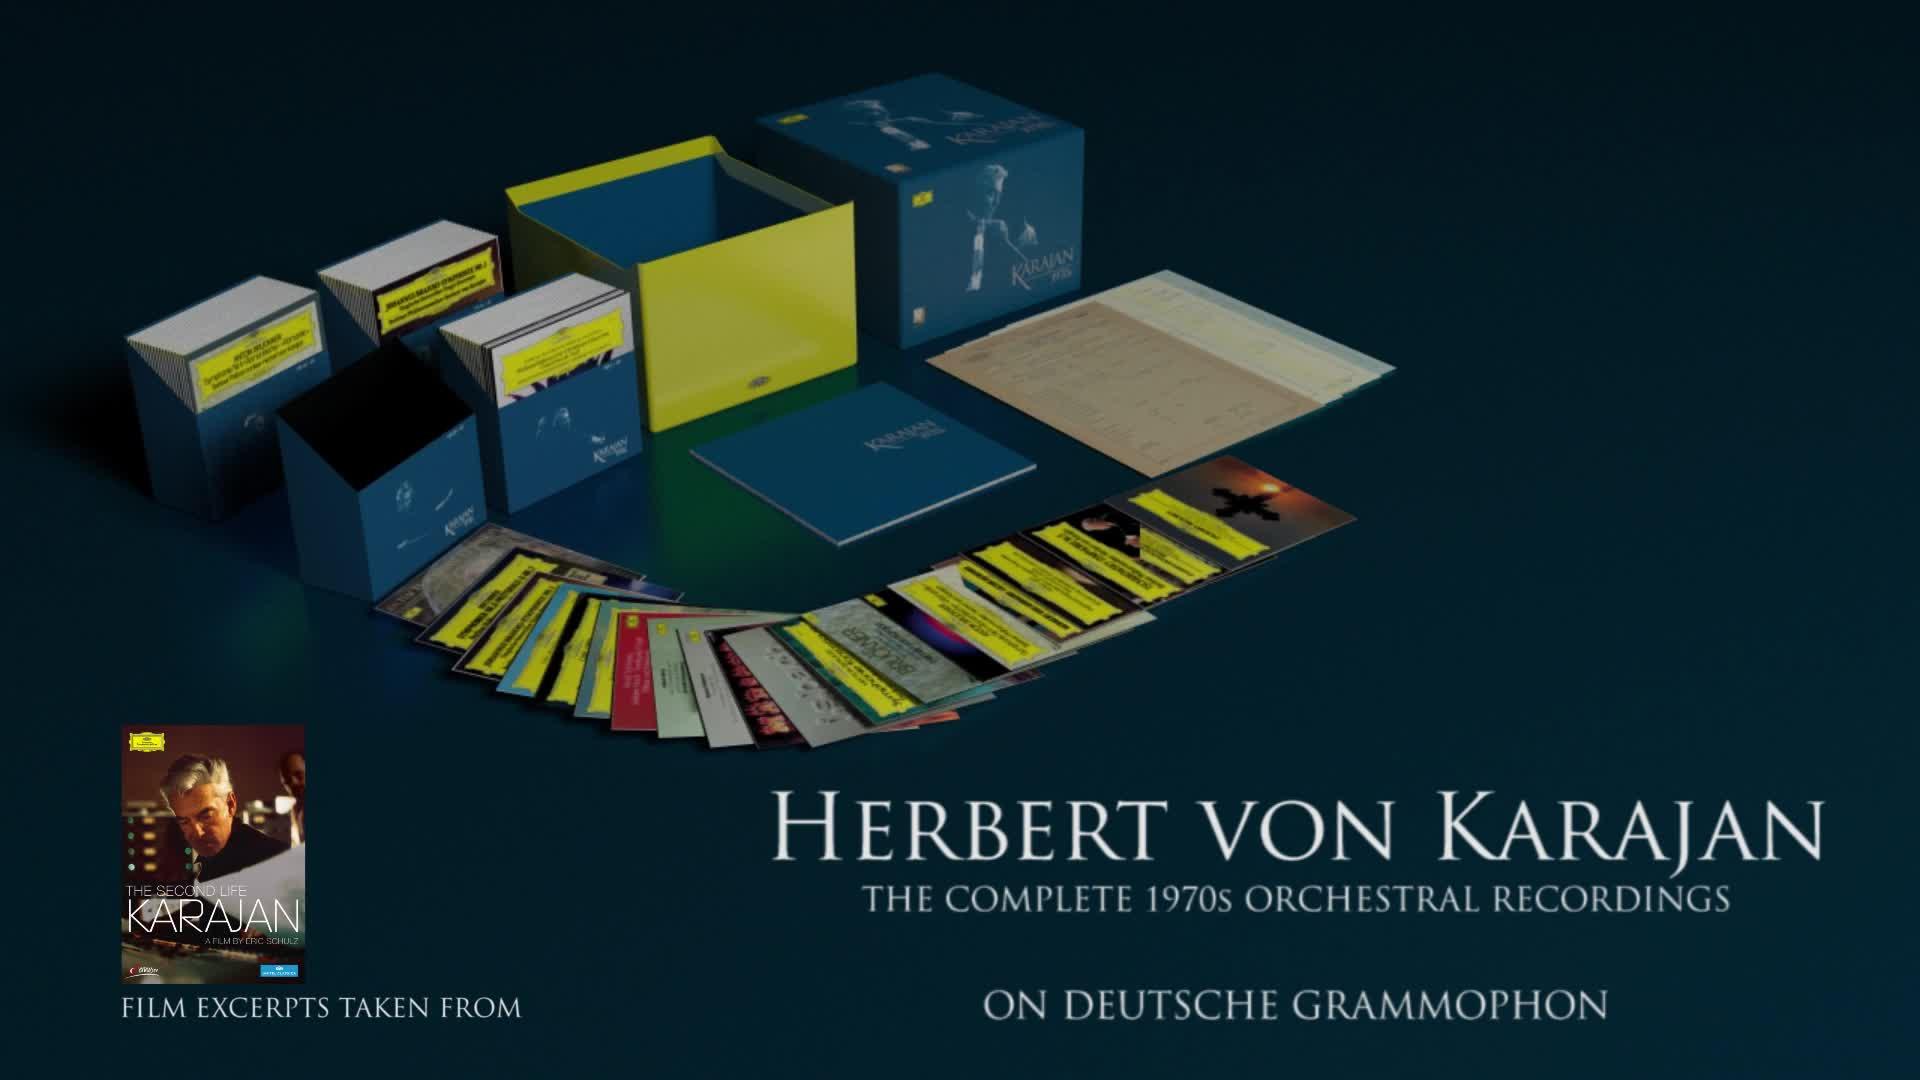 Herbert von Karajan, Karajan 1970s (Teaser)